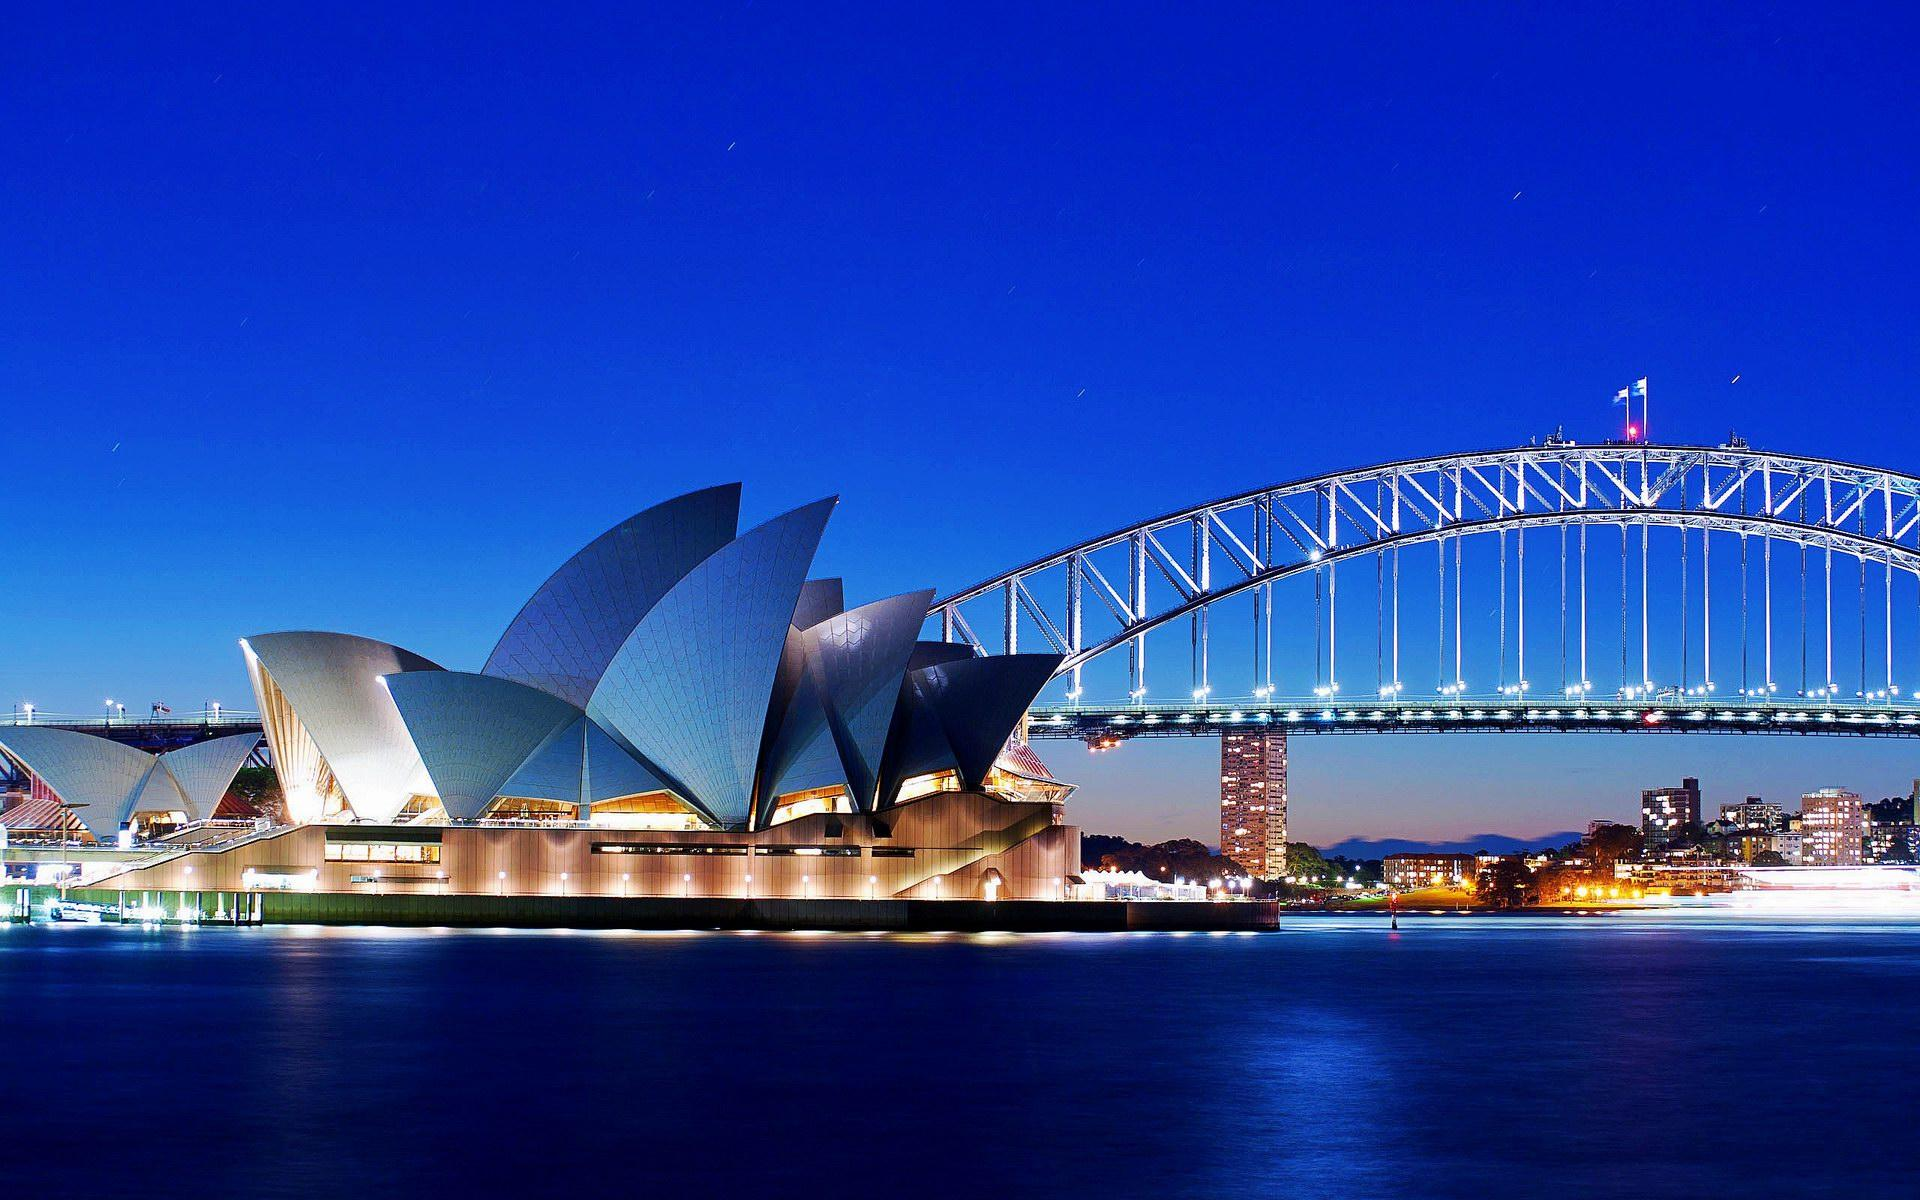 Sydney Opera House Wallpaper - WallpaperSafari